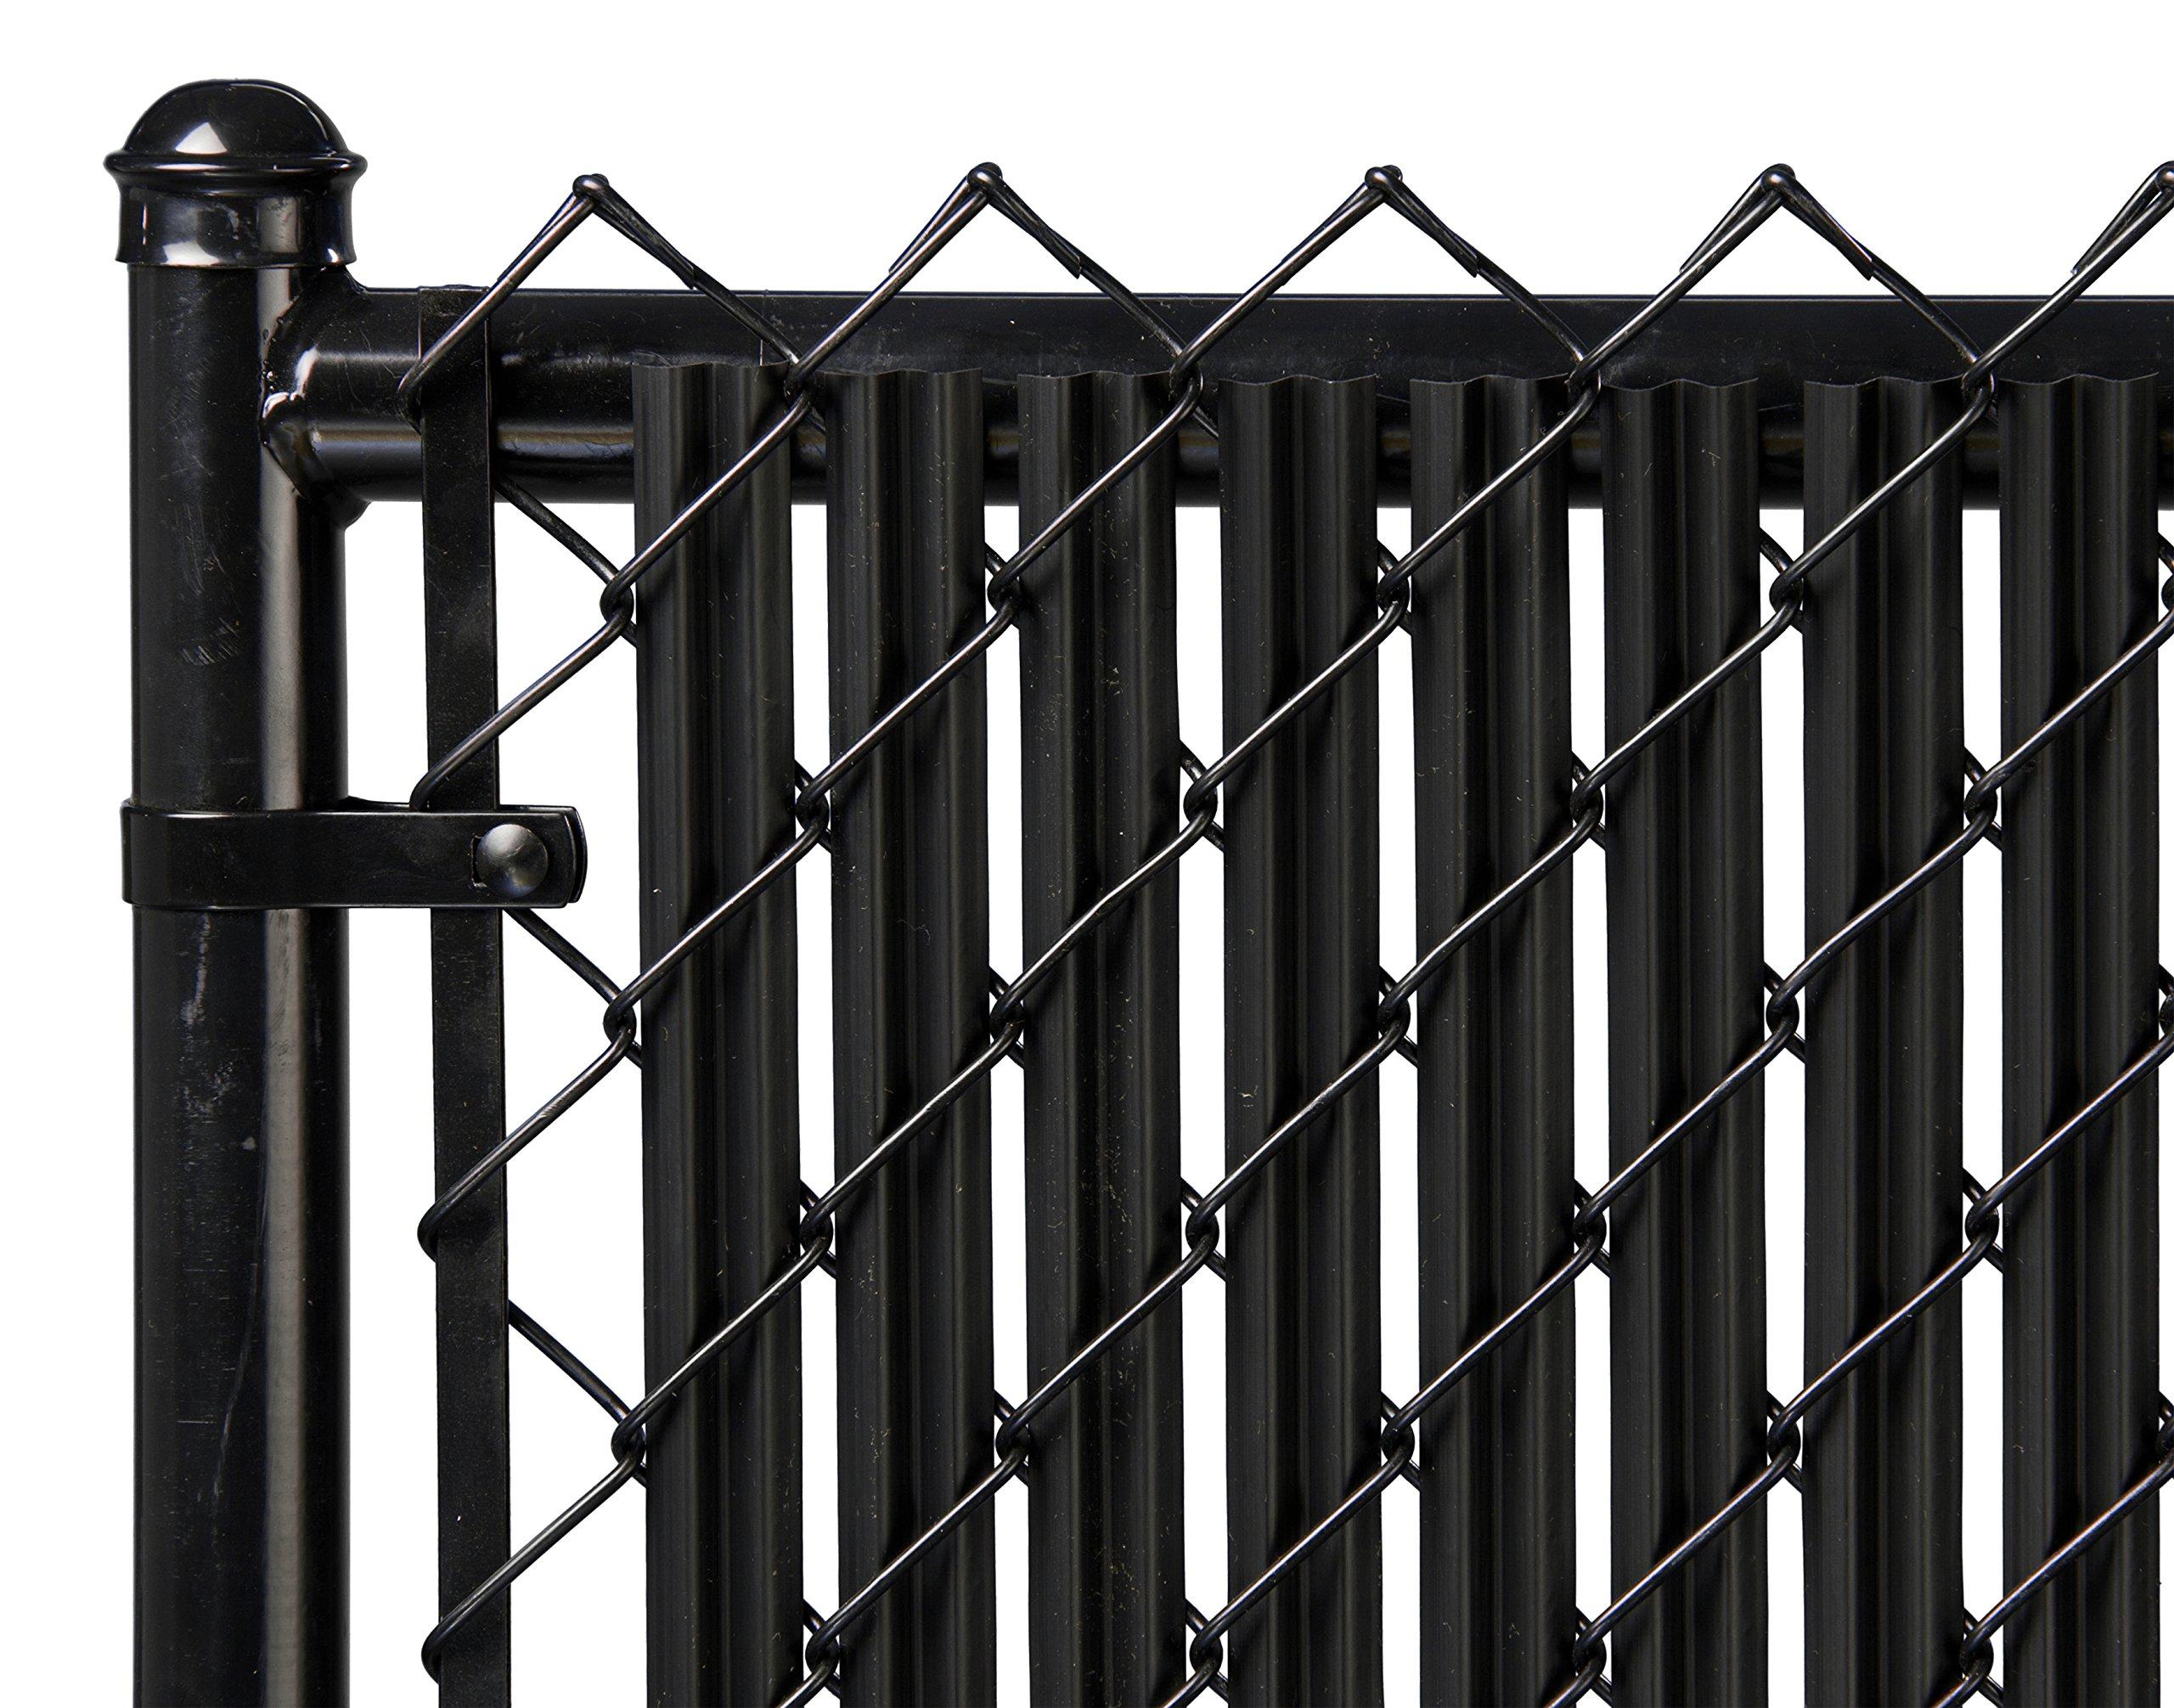 Ridged Slats Slat Depot Single Wall Bottom Locking Privacy Slat for 3', 4', 5', 6', 7' and 8' Chain Link Fence (6ft, Black) by Ridged Slats